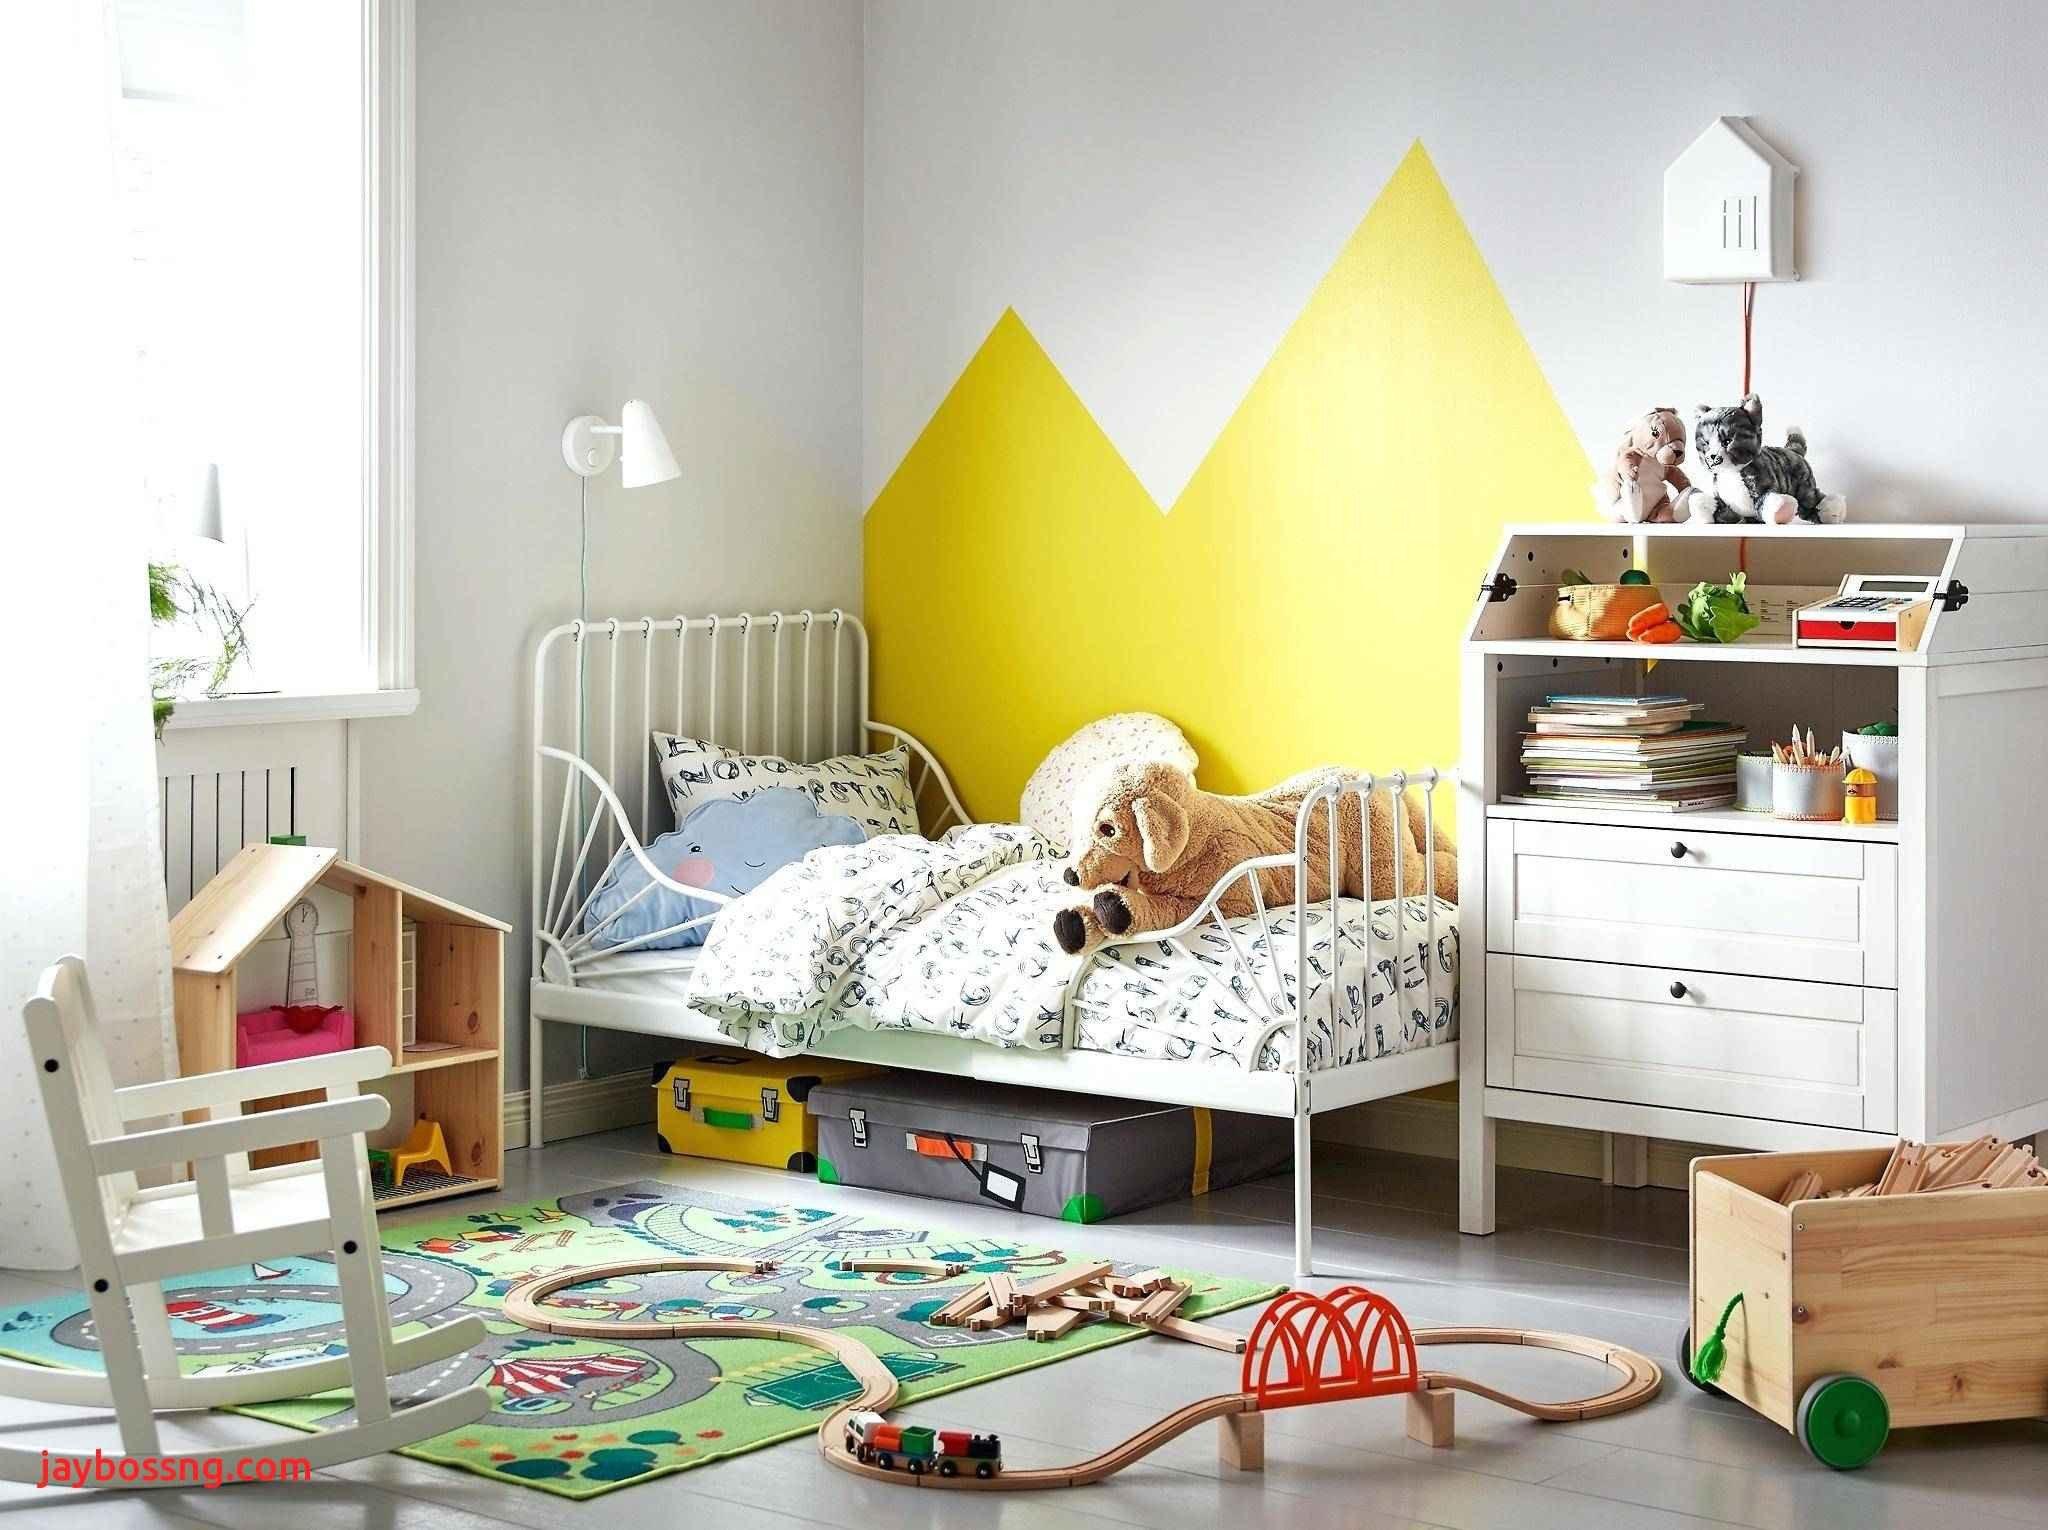 Ikea Bedroom Furniture Set Luxury 22 Lovable Yellow Vases Ikea